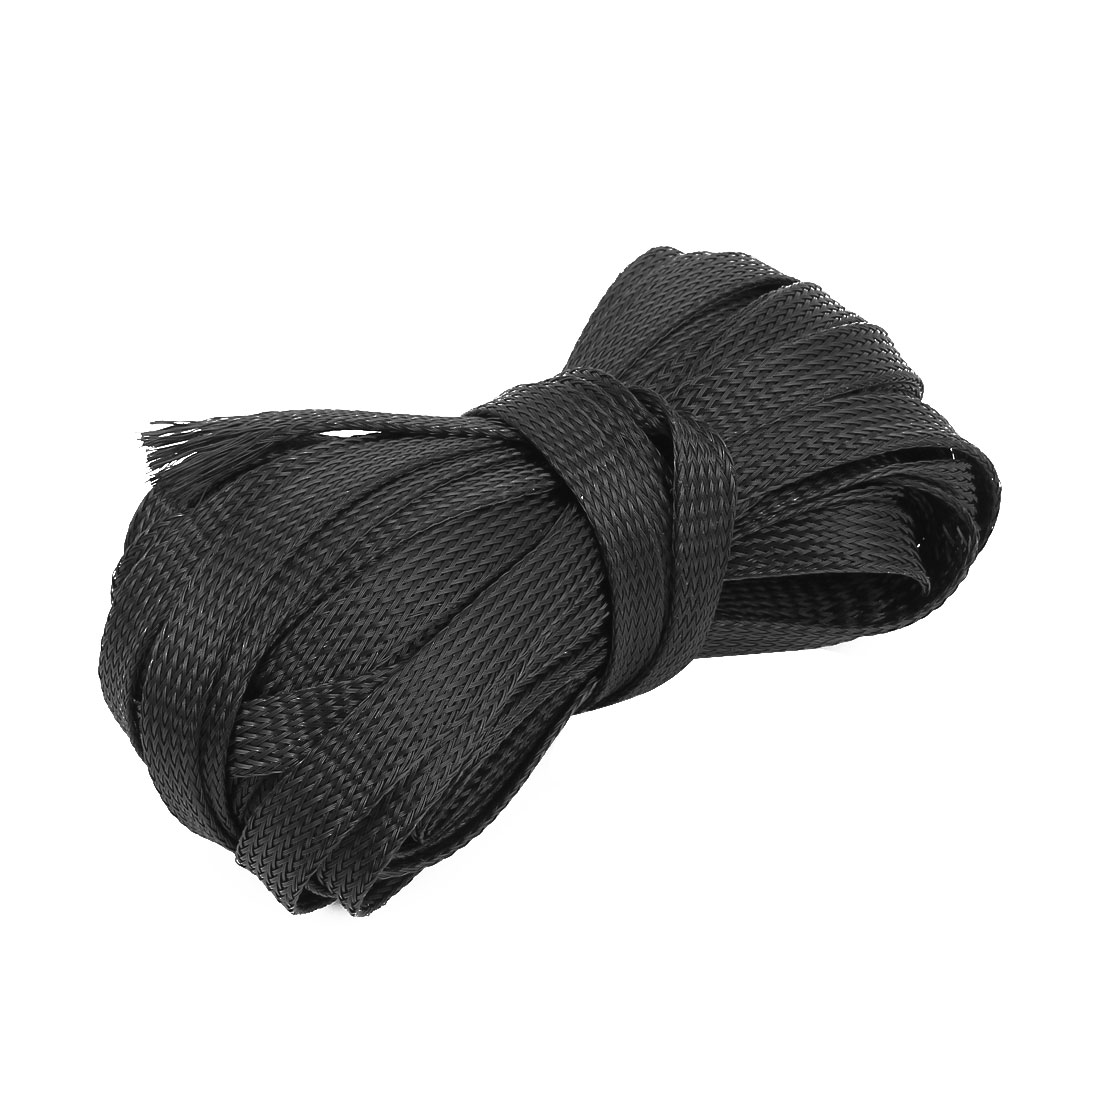 Nylon Mesh Rigging Conduit Flex Braided Expandable Sleeving Black 15M Long 10mm Wide